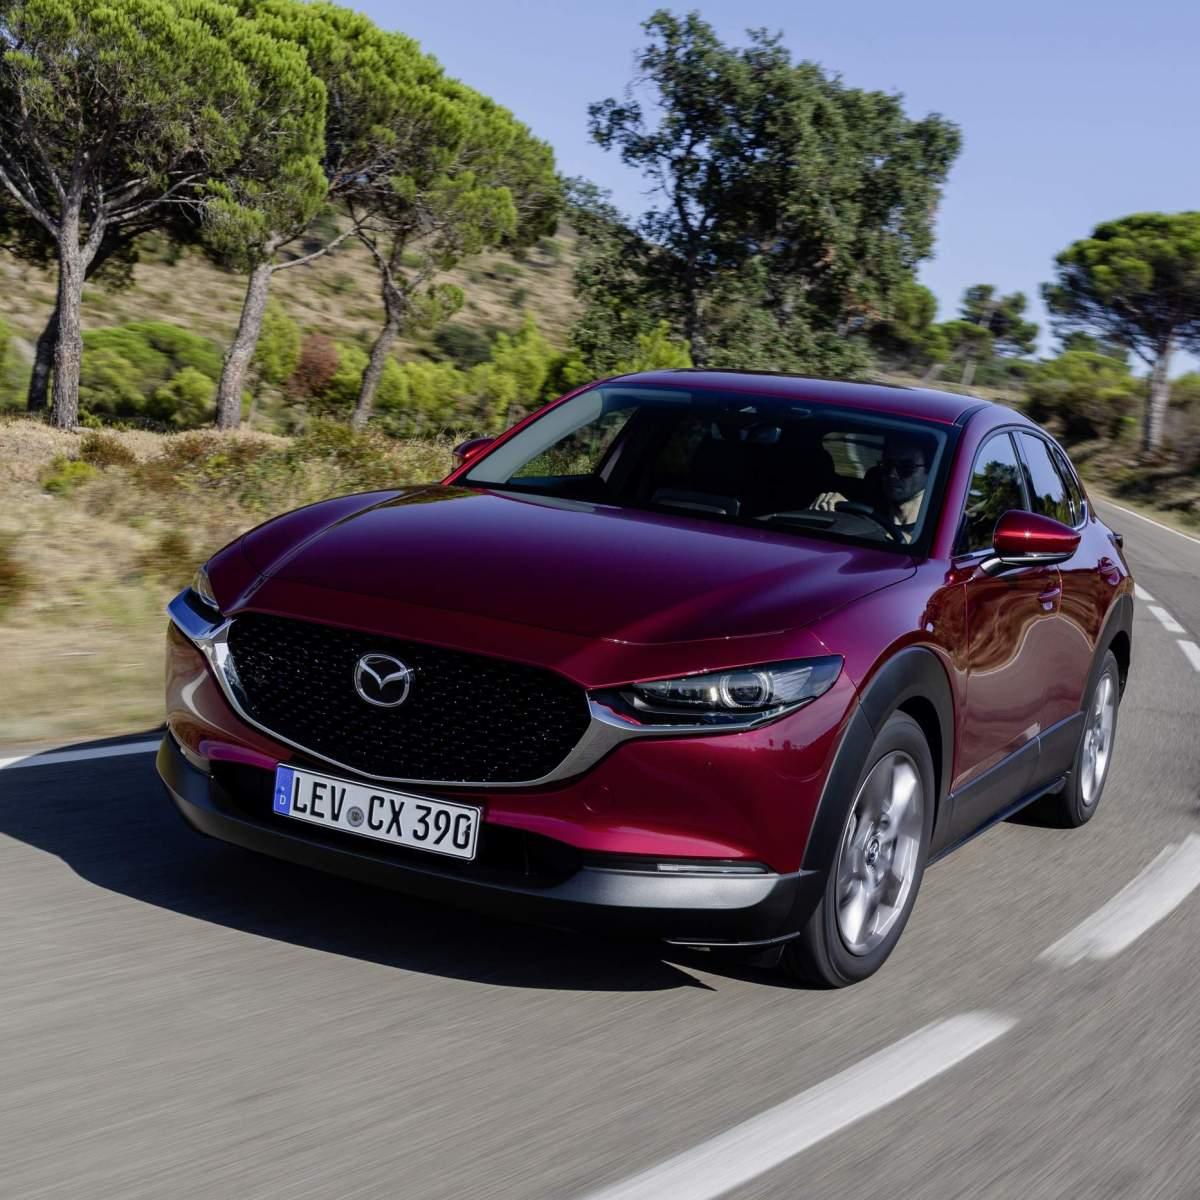 Mazda_CX-30_Girona2019_Action_08